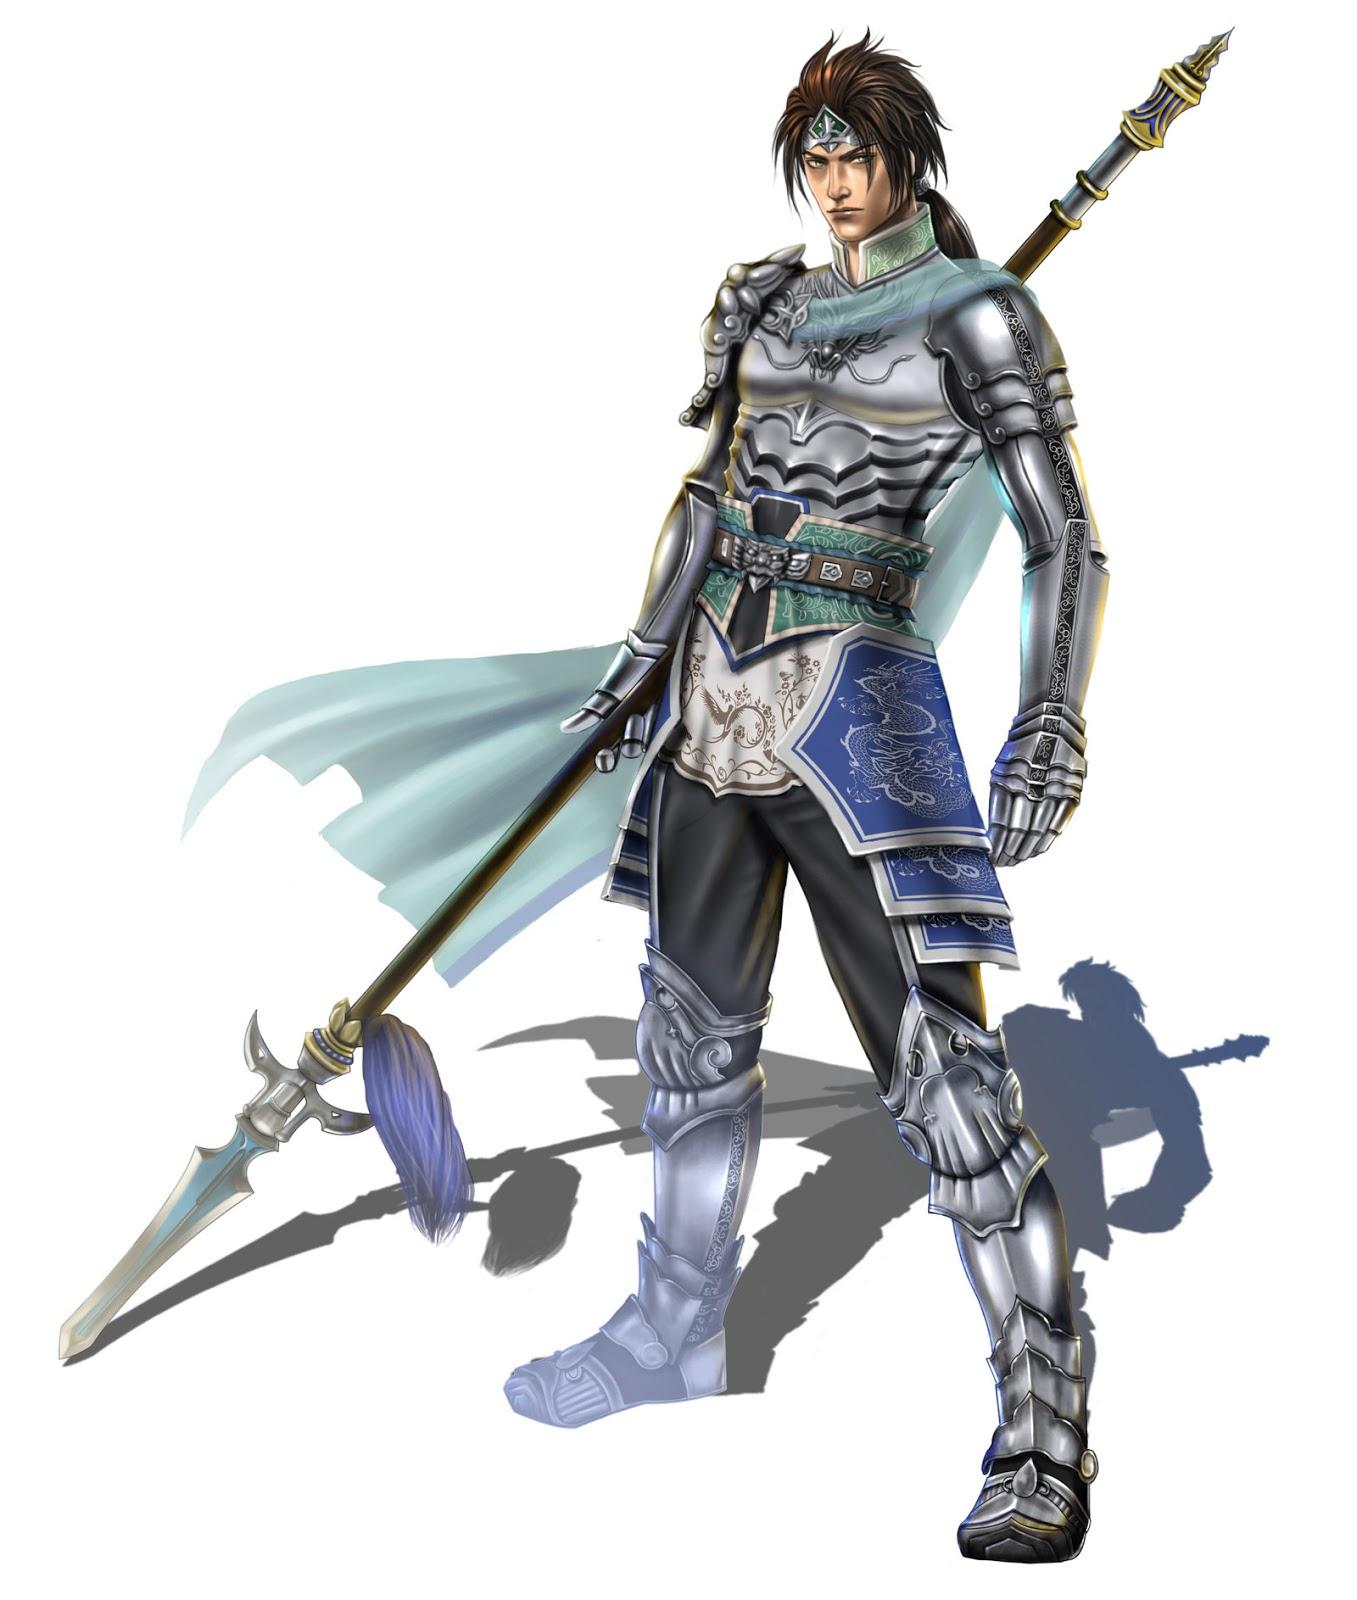 Drawn warrior zhou dynasty Gaming Opinions Reviews Rants: Back